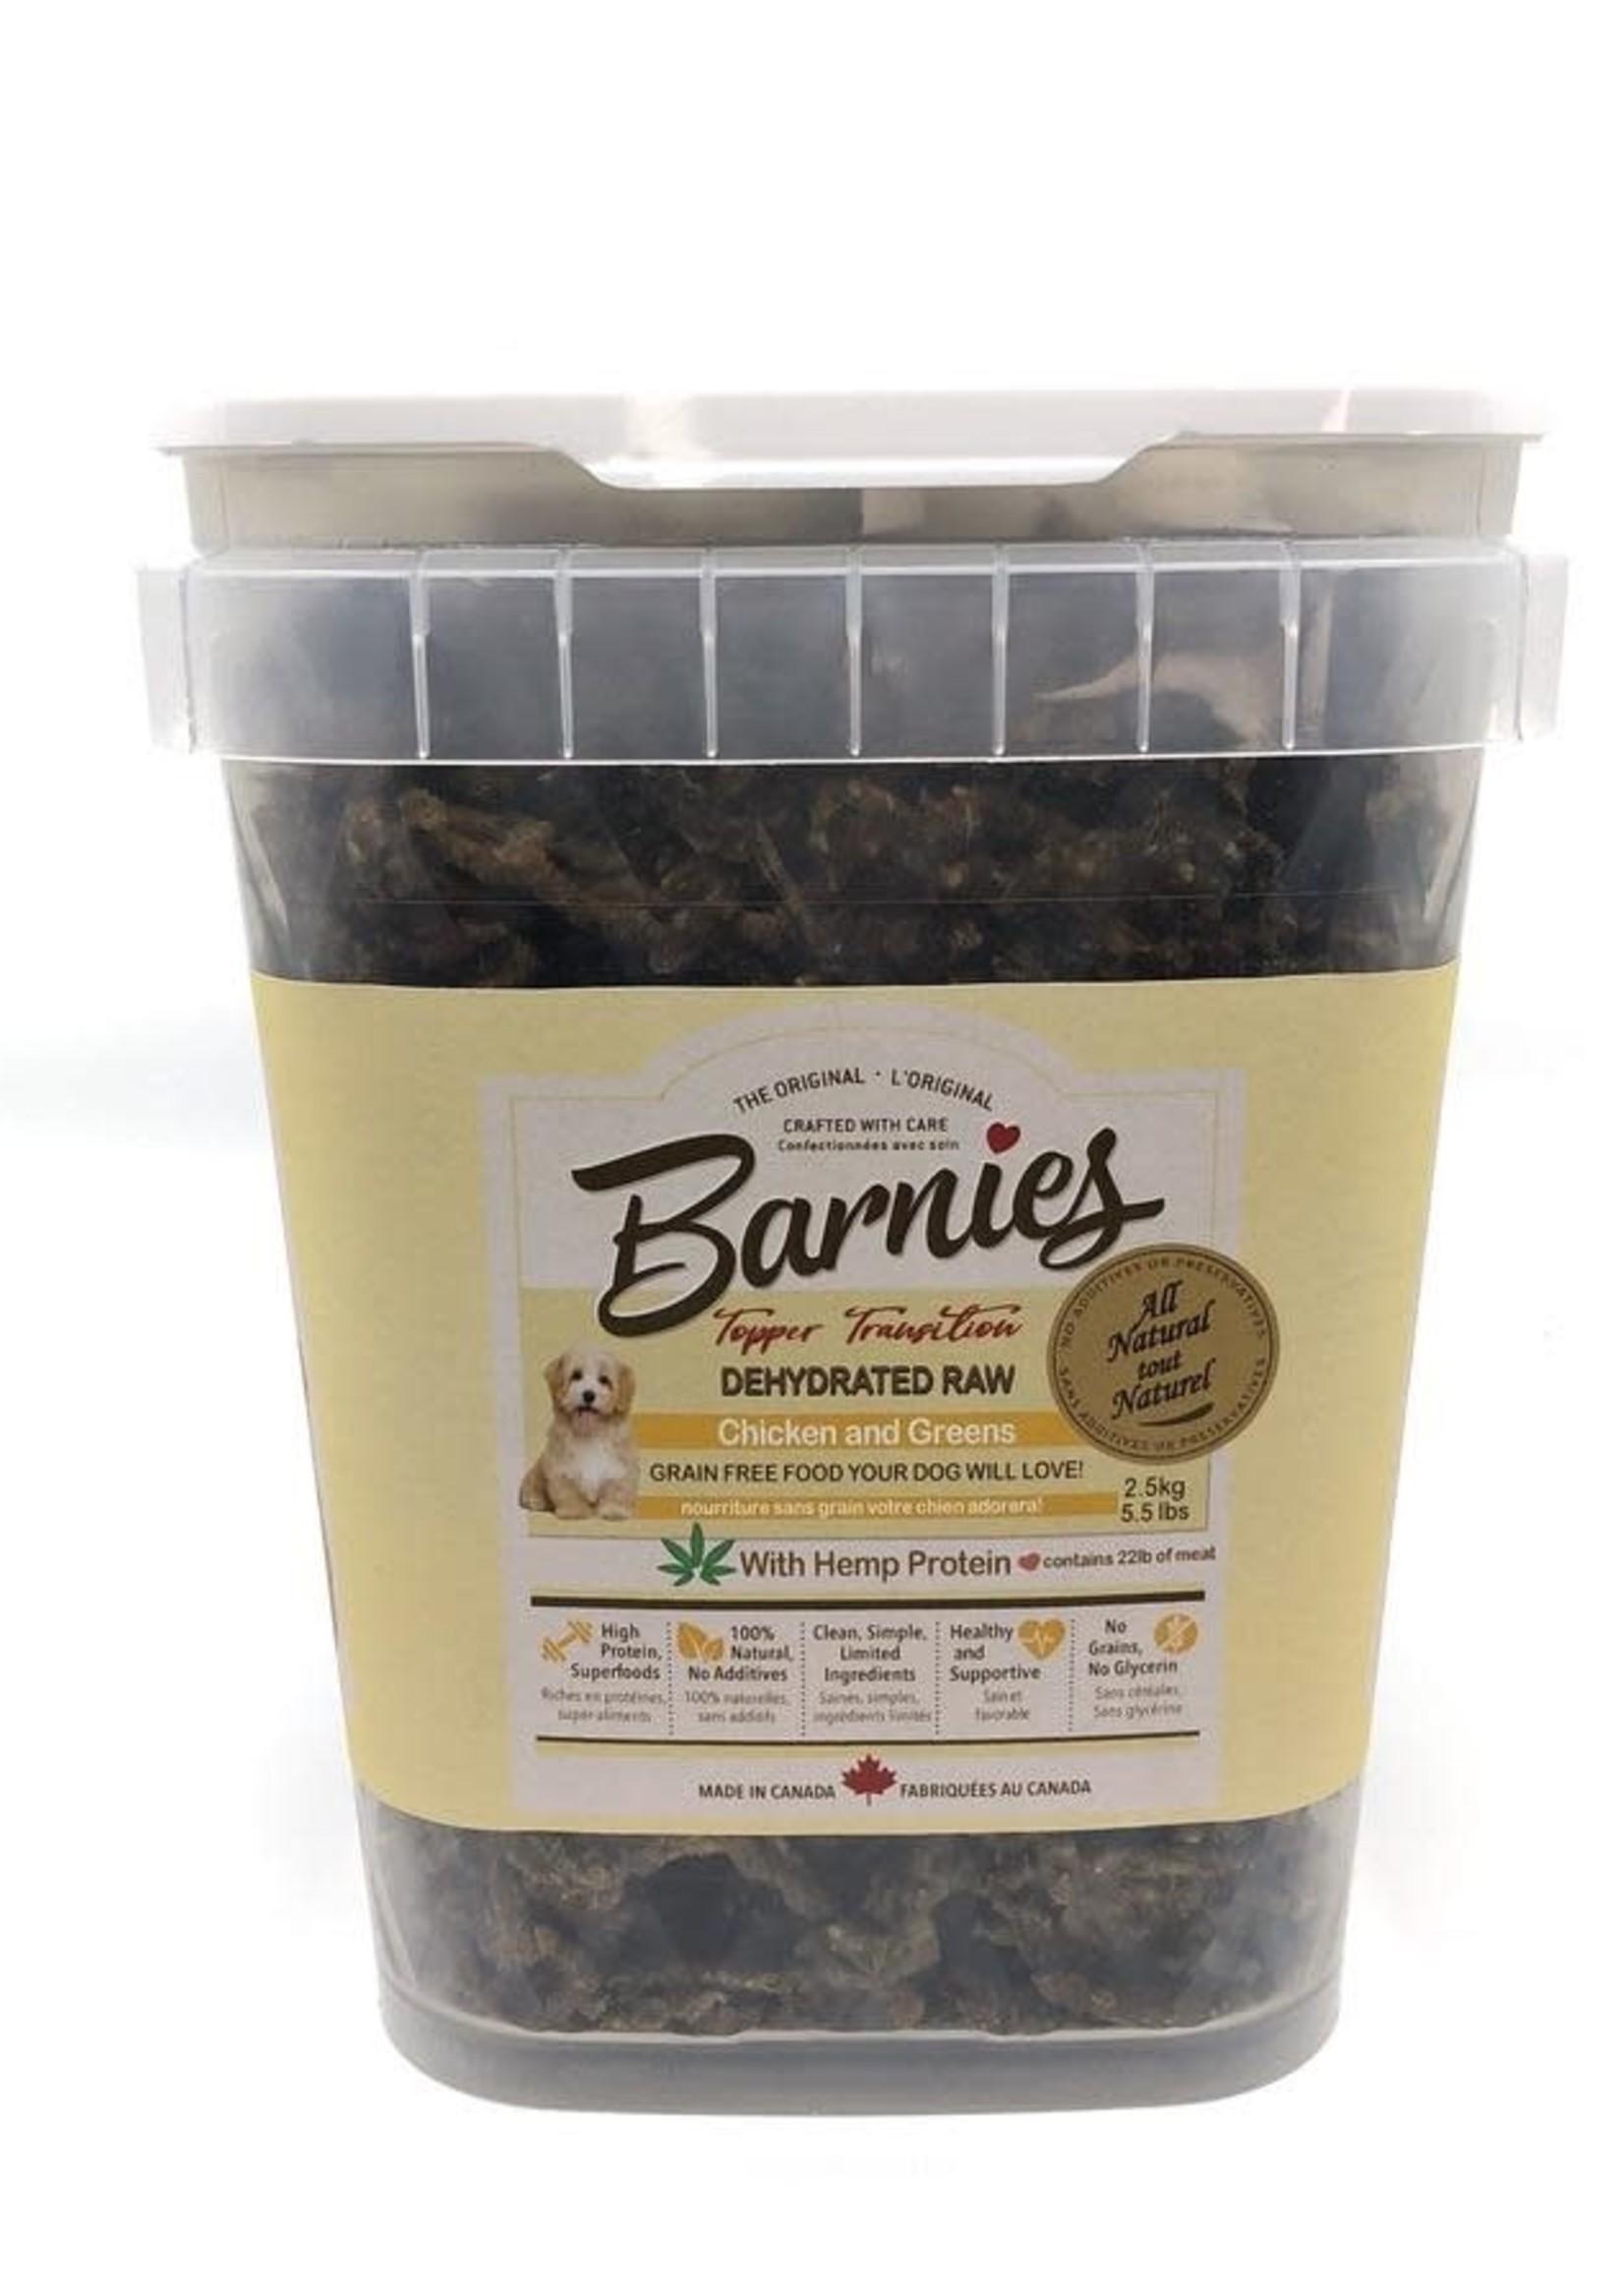 Barnies  Barnies Dehydrated Raw Chicken & Greens 2.5kG